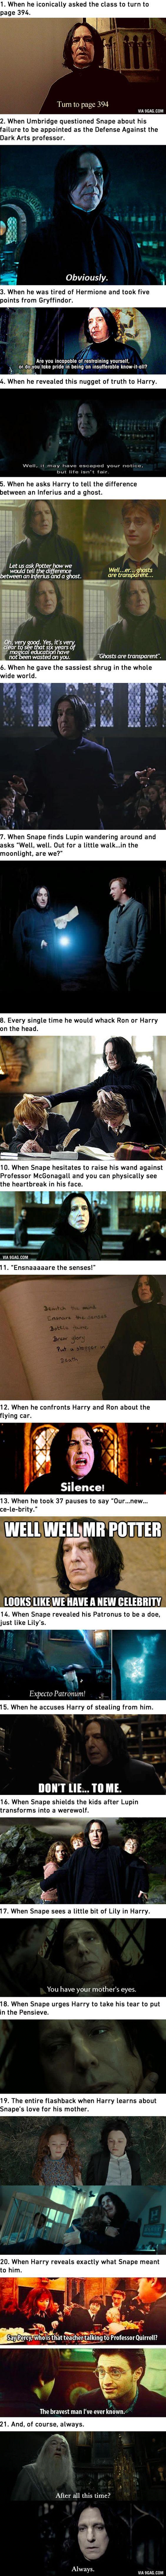 "21 Professor Snape Moments In ""Harry Potter"" That Make Us Love Him Gotta love Severus"